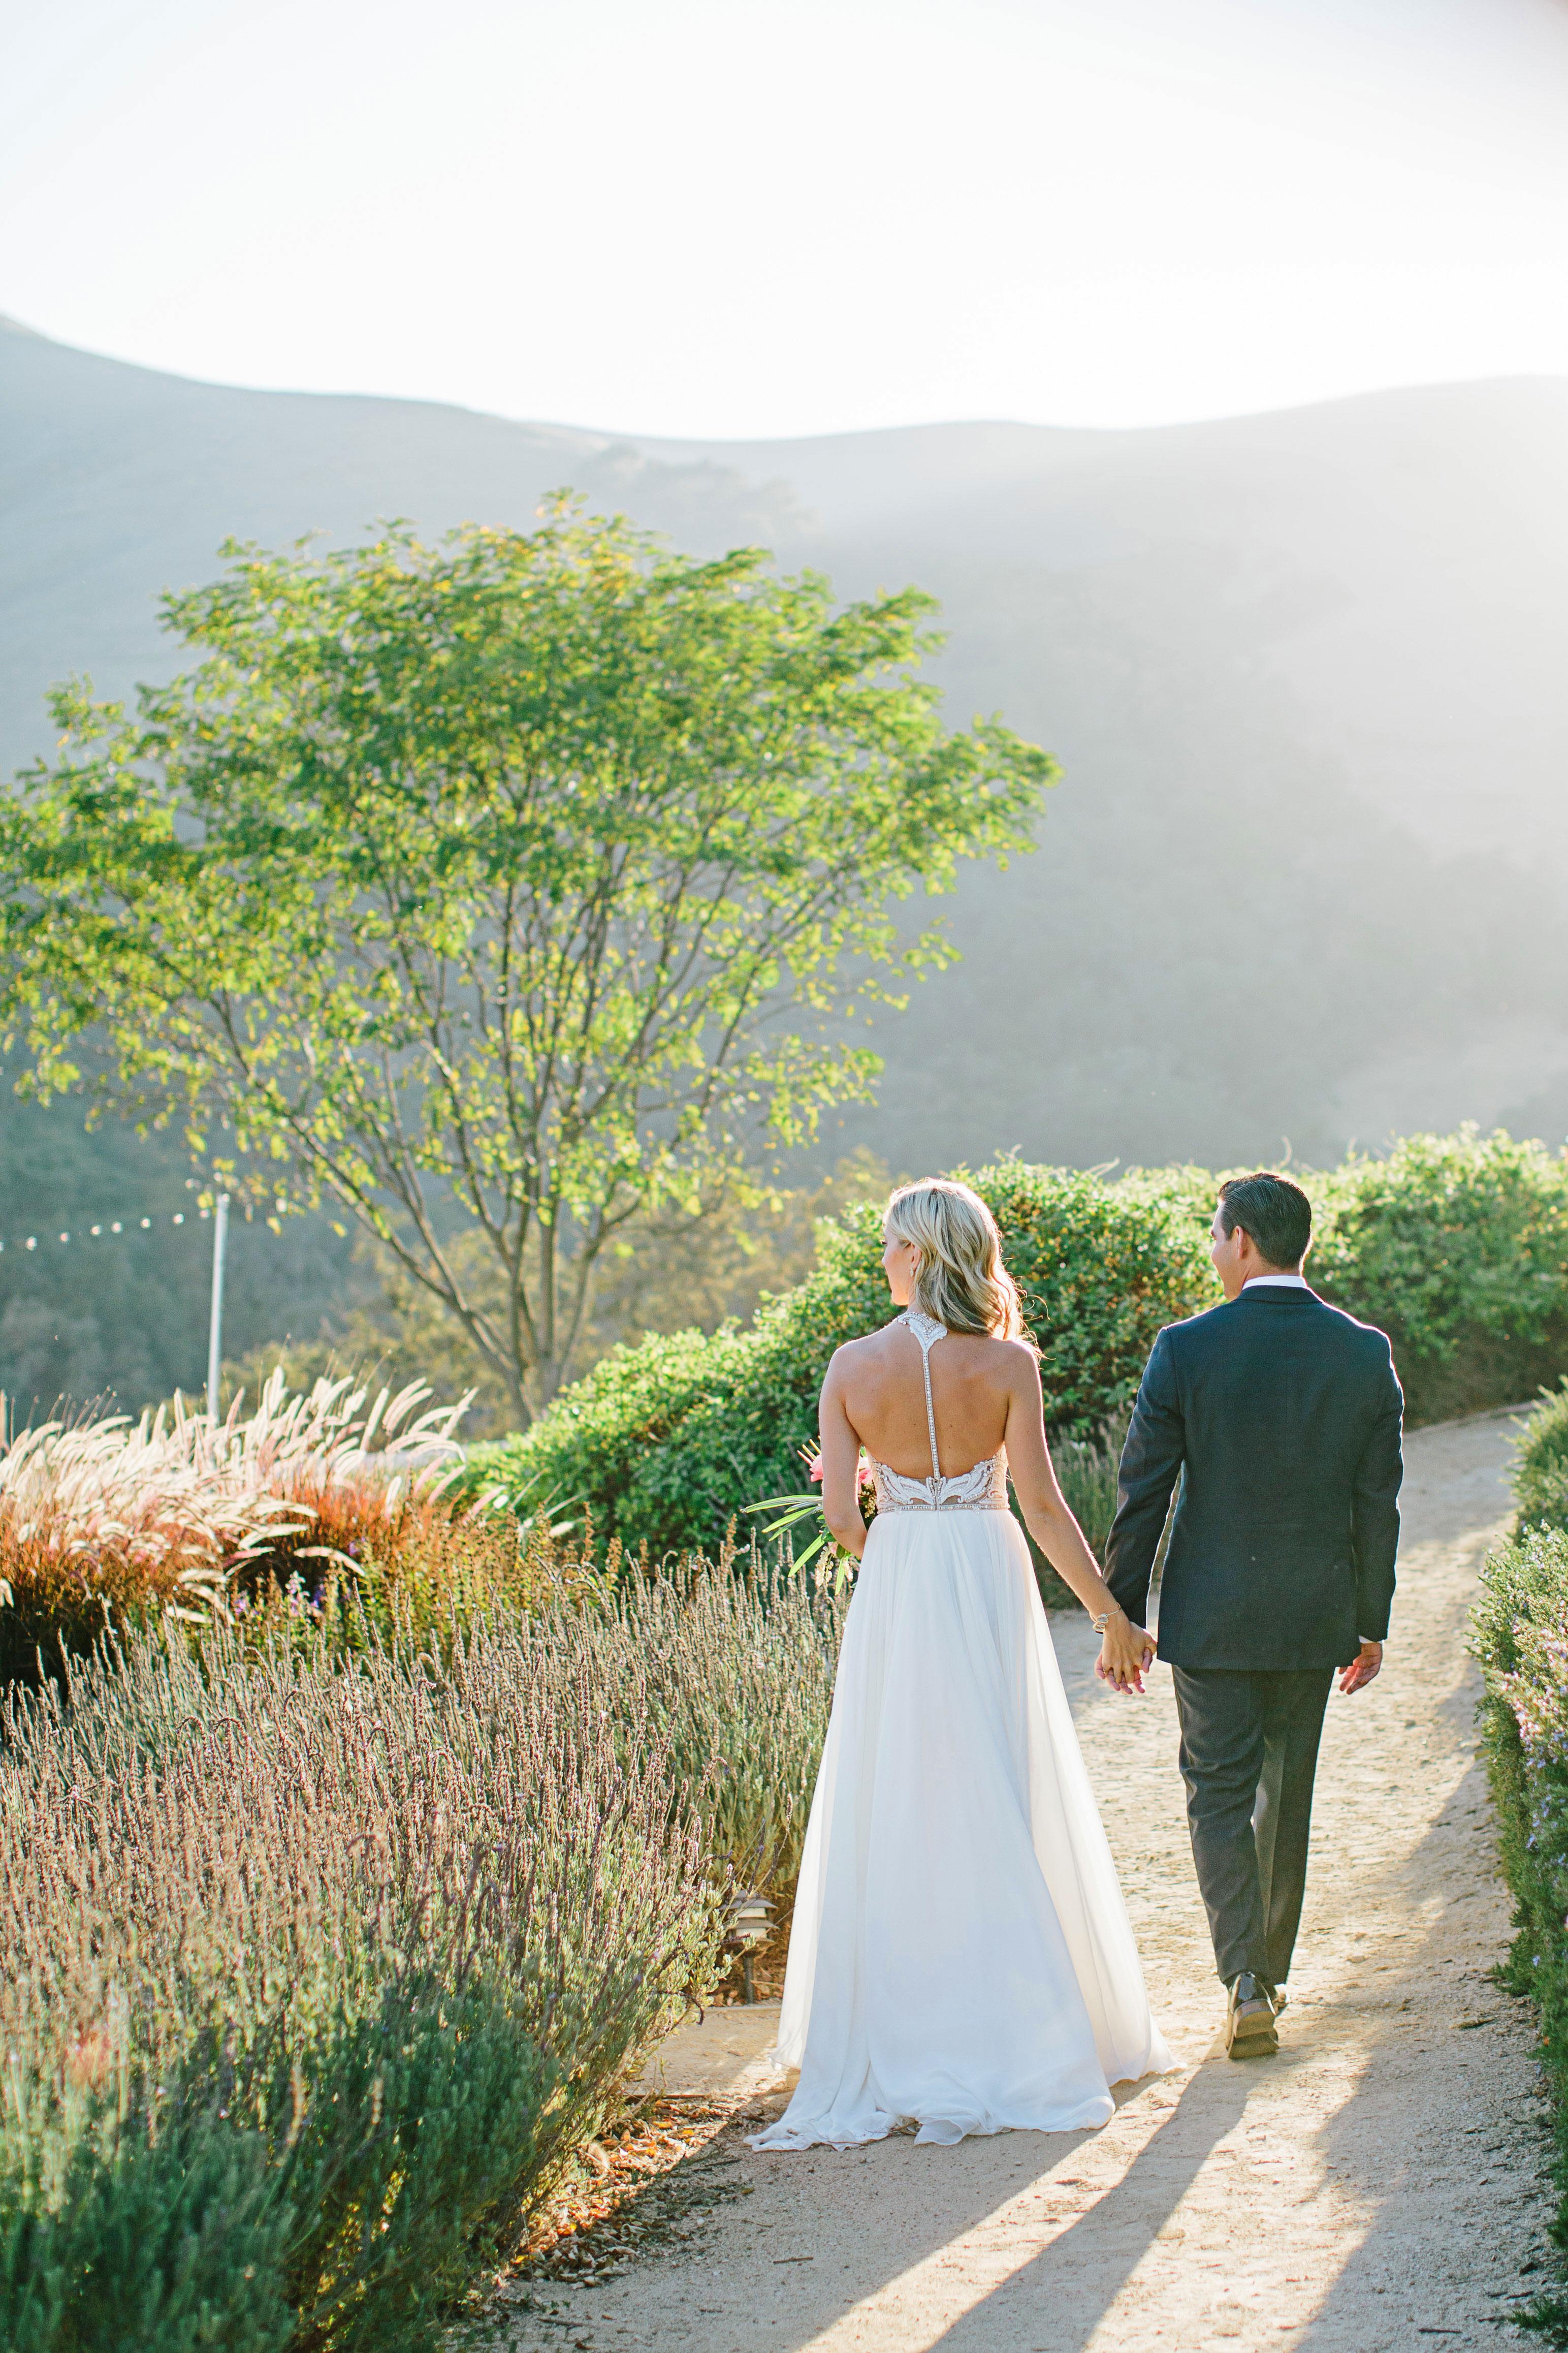 stephanie jared wedding couple on road